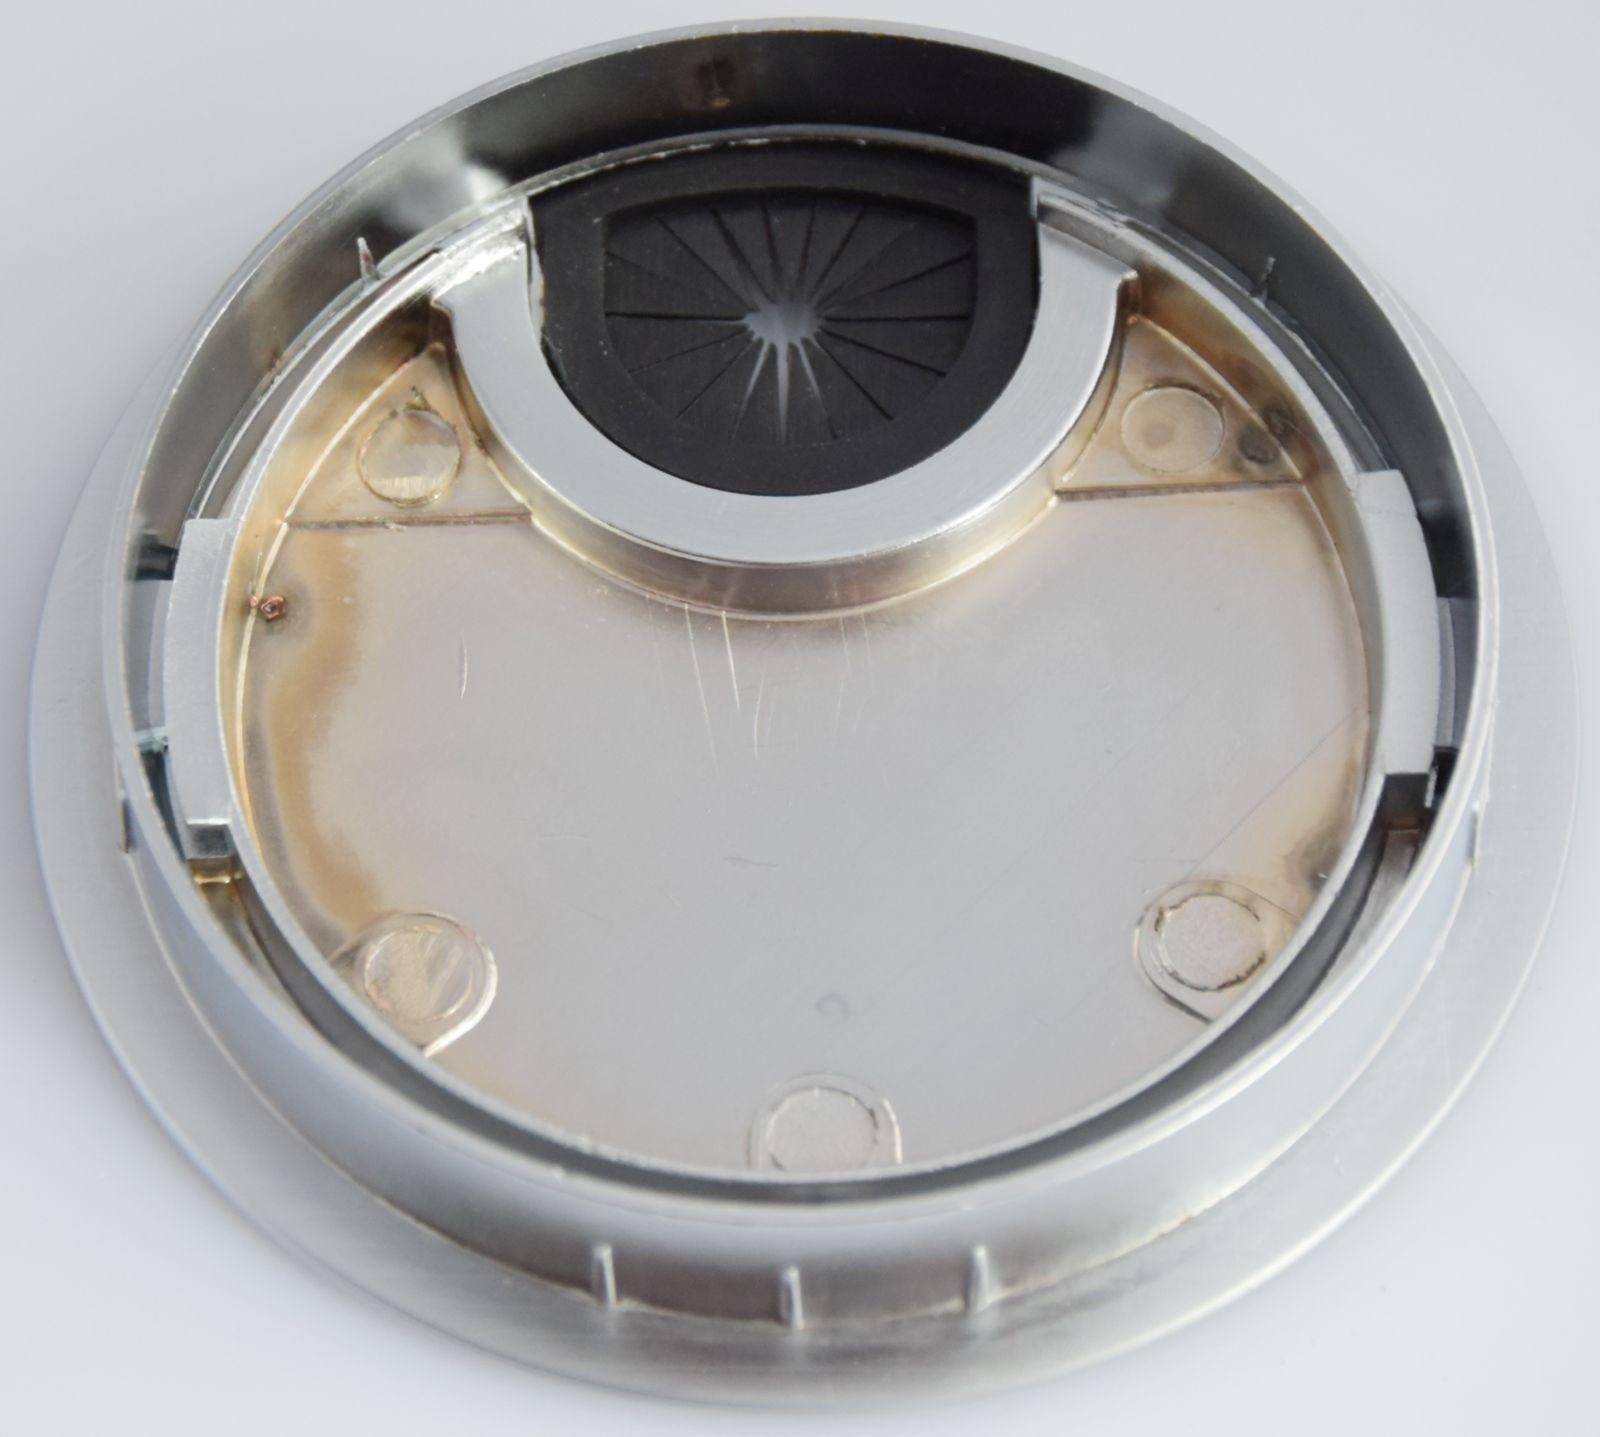 Kabeldurchlass Ø 60, 80 mm Metall Aluminiumoptik Kabeldose ...